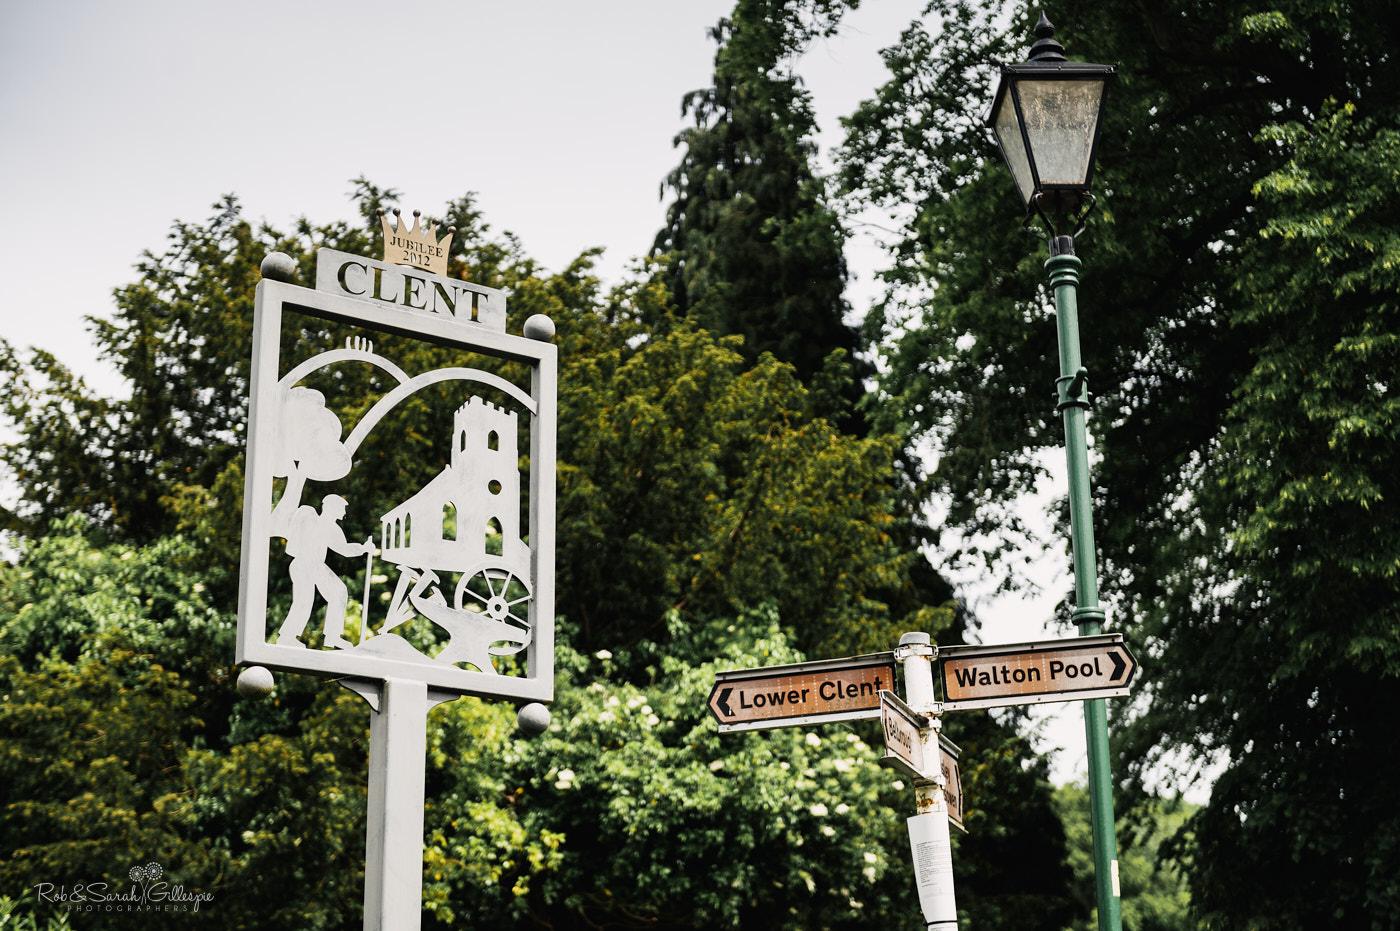 Clent village signs